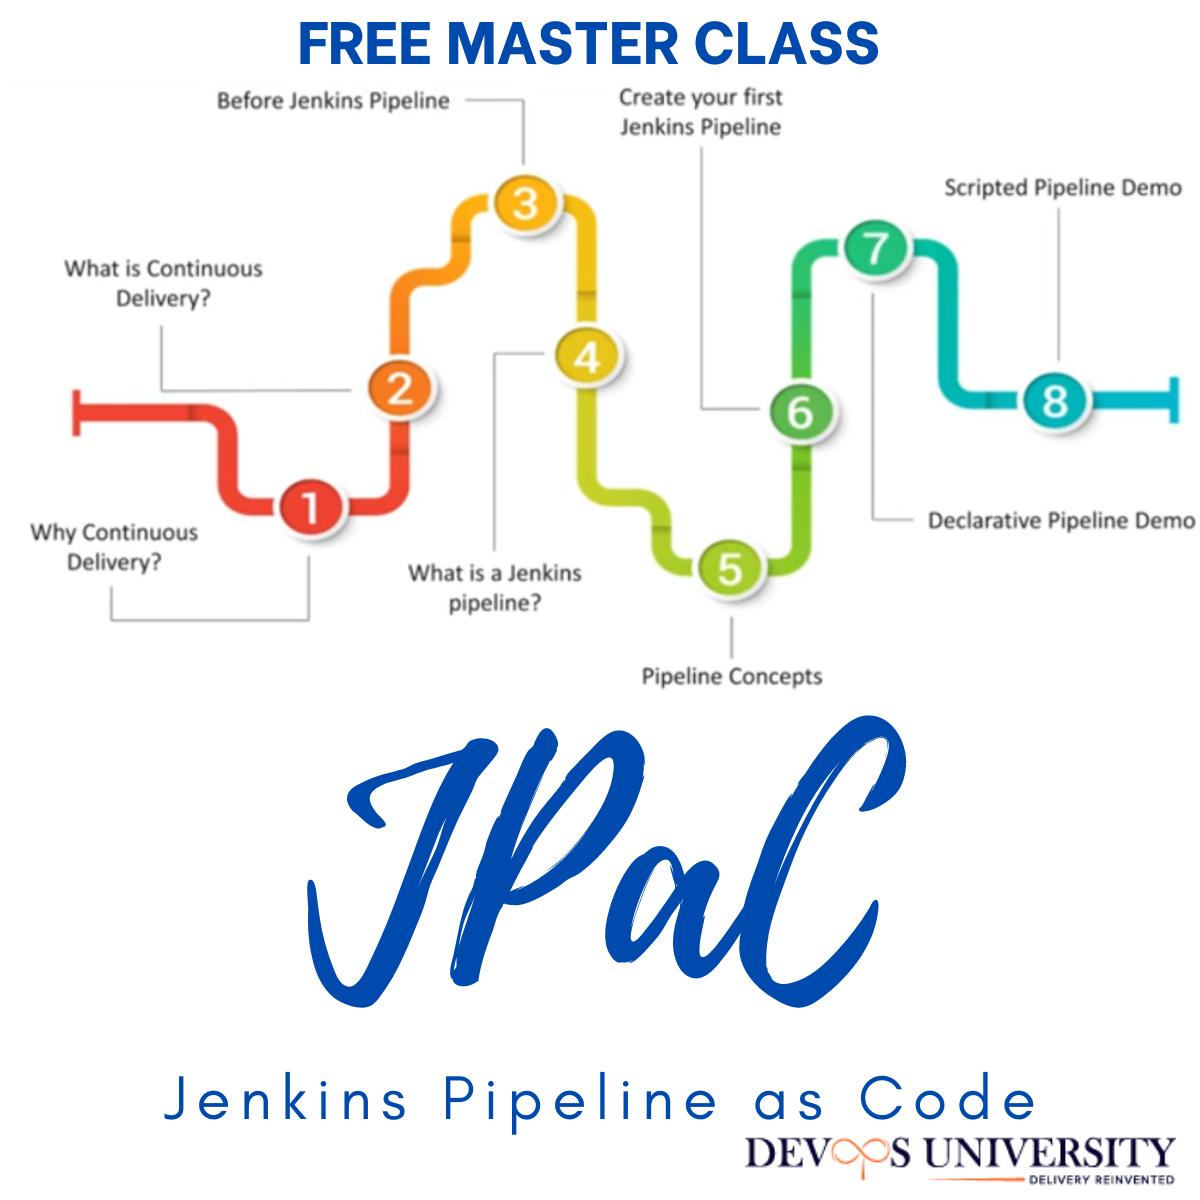 Master Class on Jenkins Pipeline as Code (JPaC)